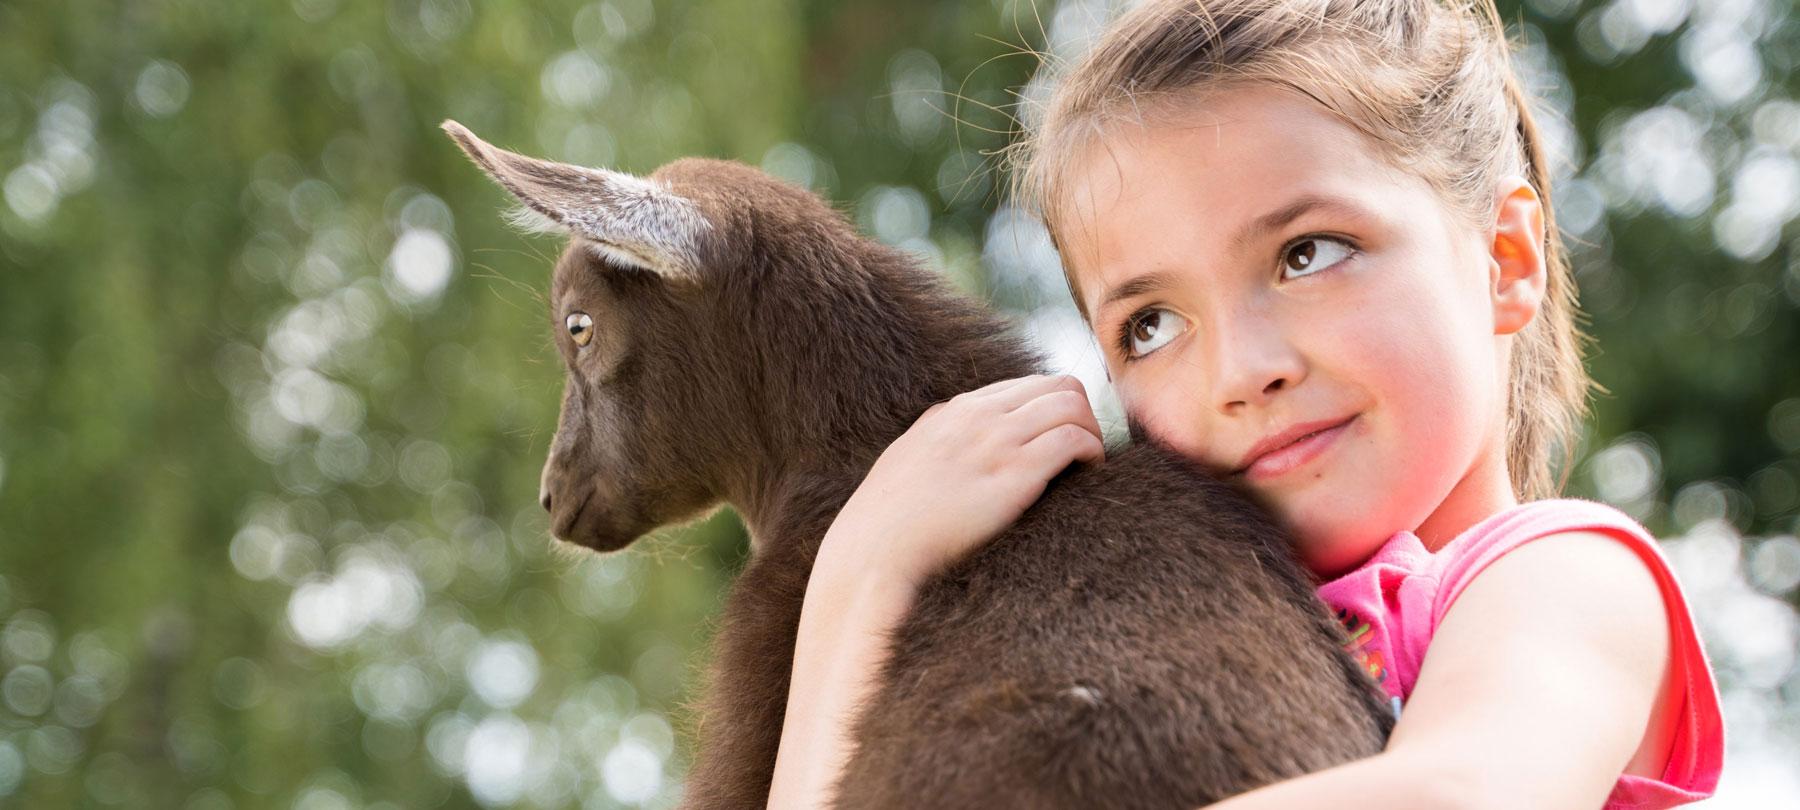 Ella holds a baby goat